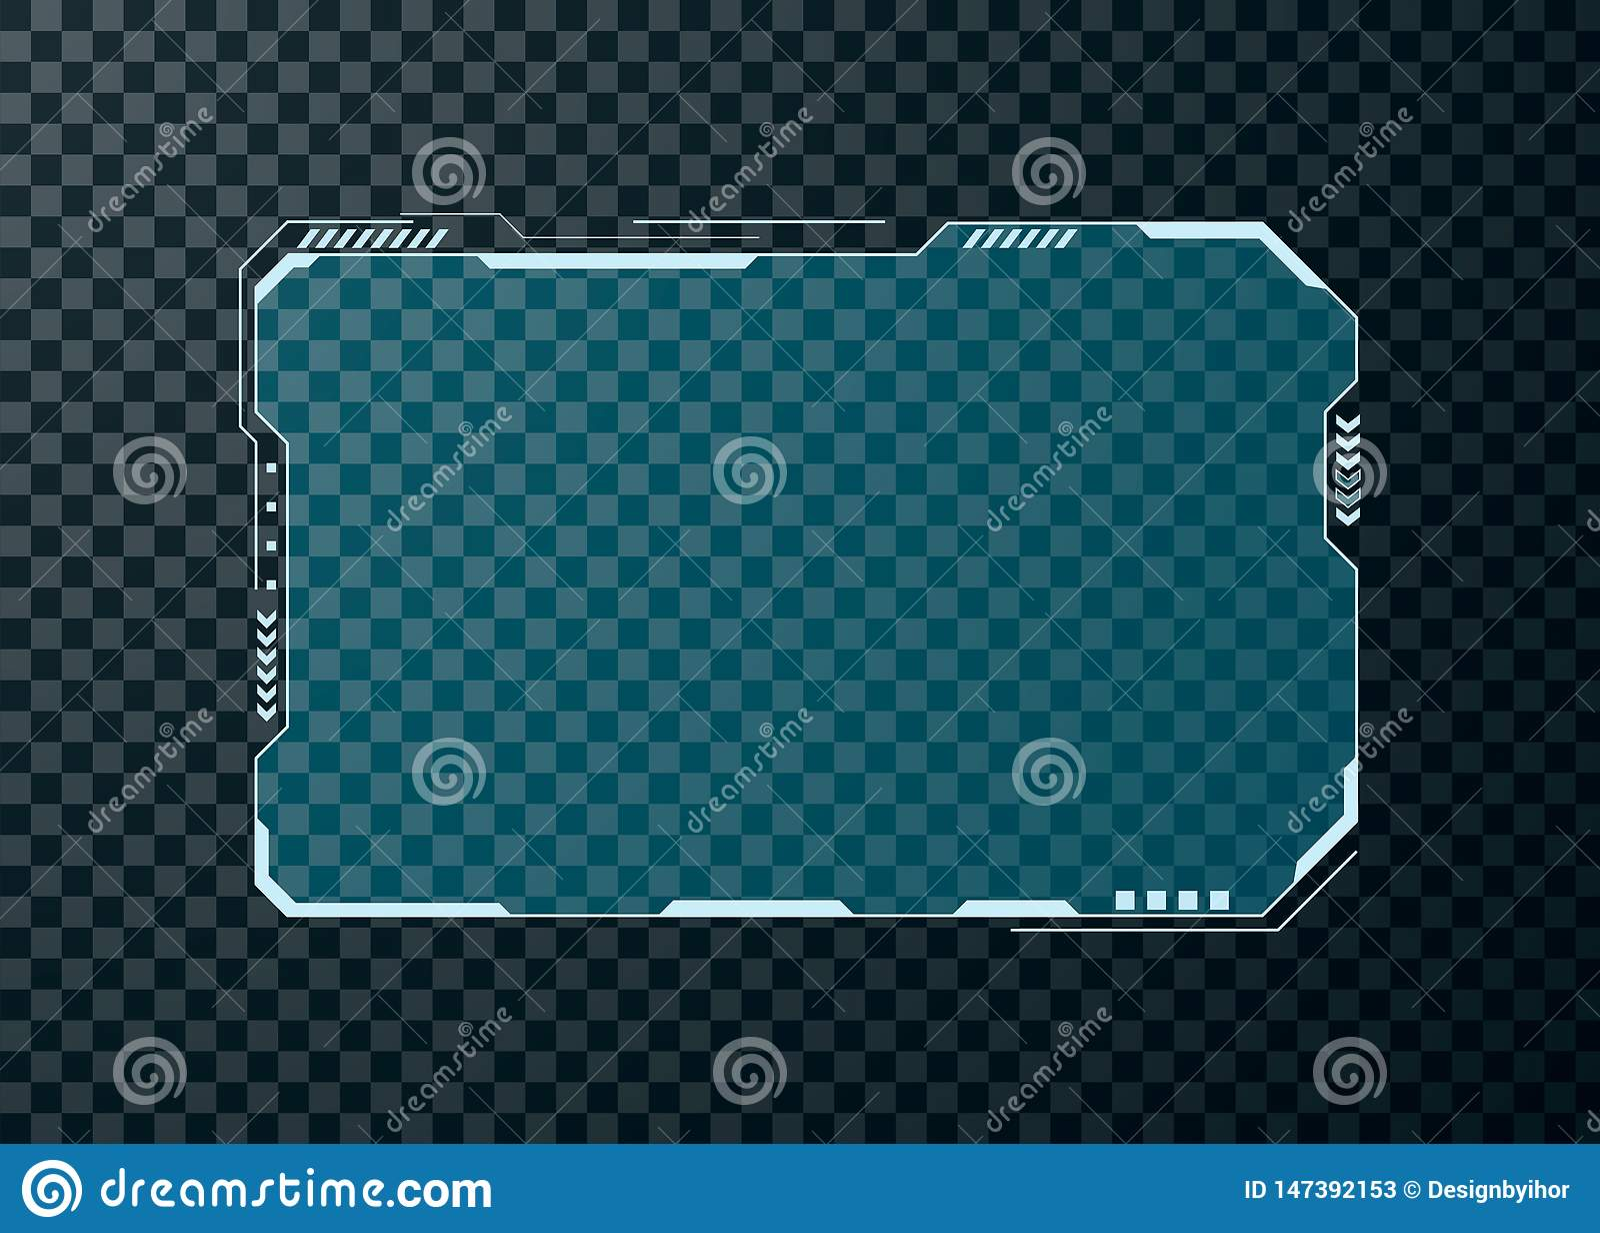 Elemento de tela futurista da interface de usuário de HUD Projeto abstrato da disposi??o do painel de controle Exposi??o virtual